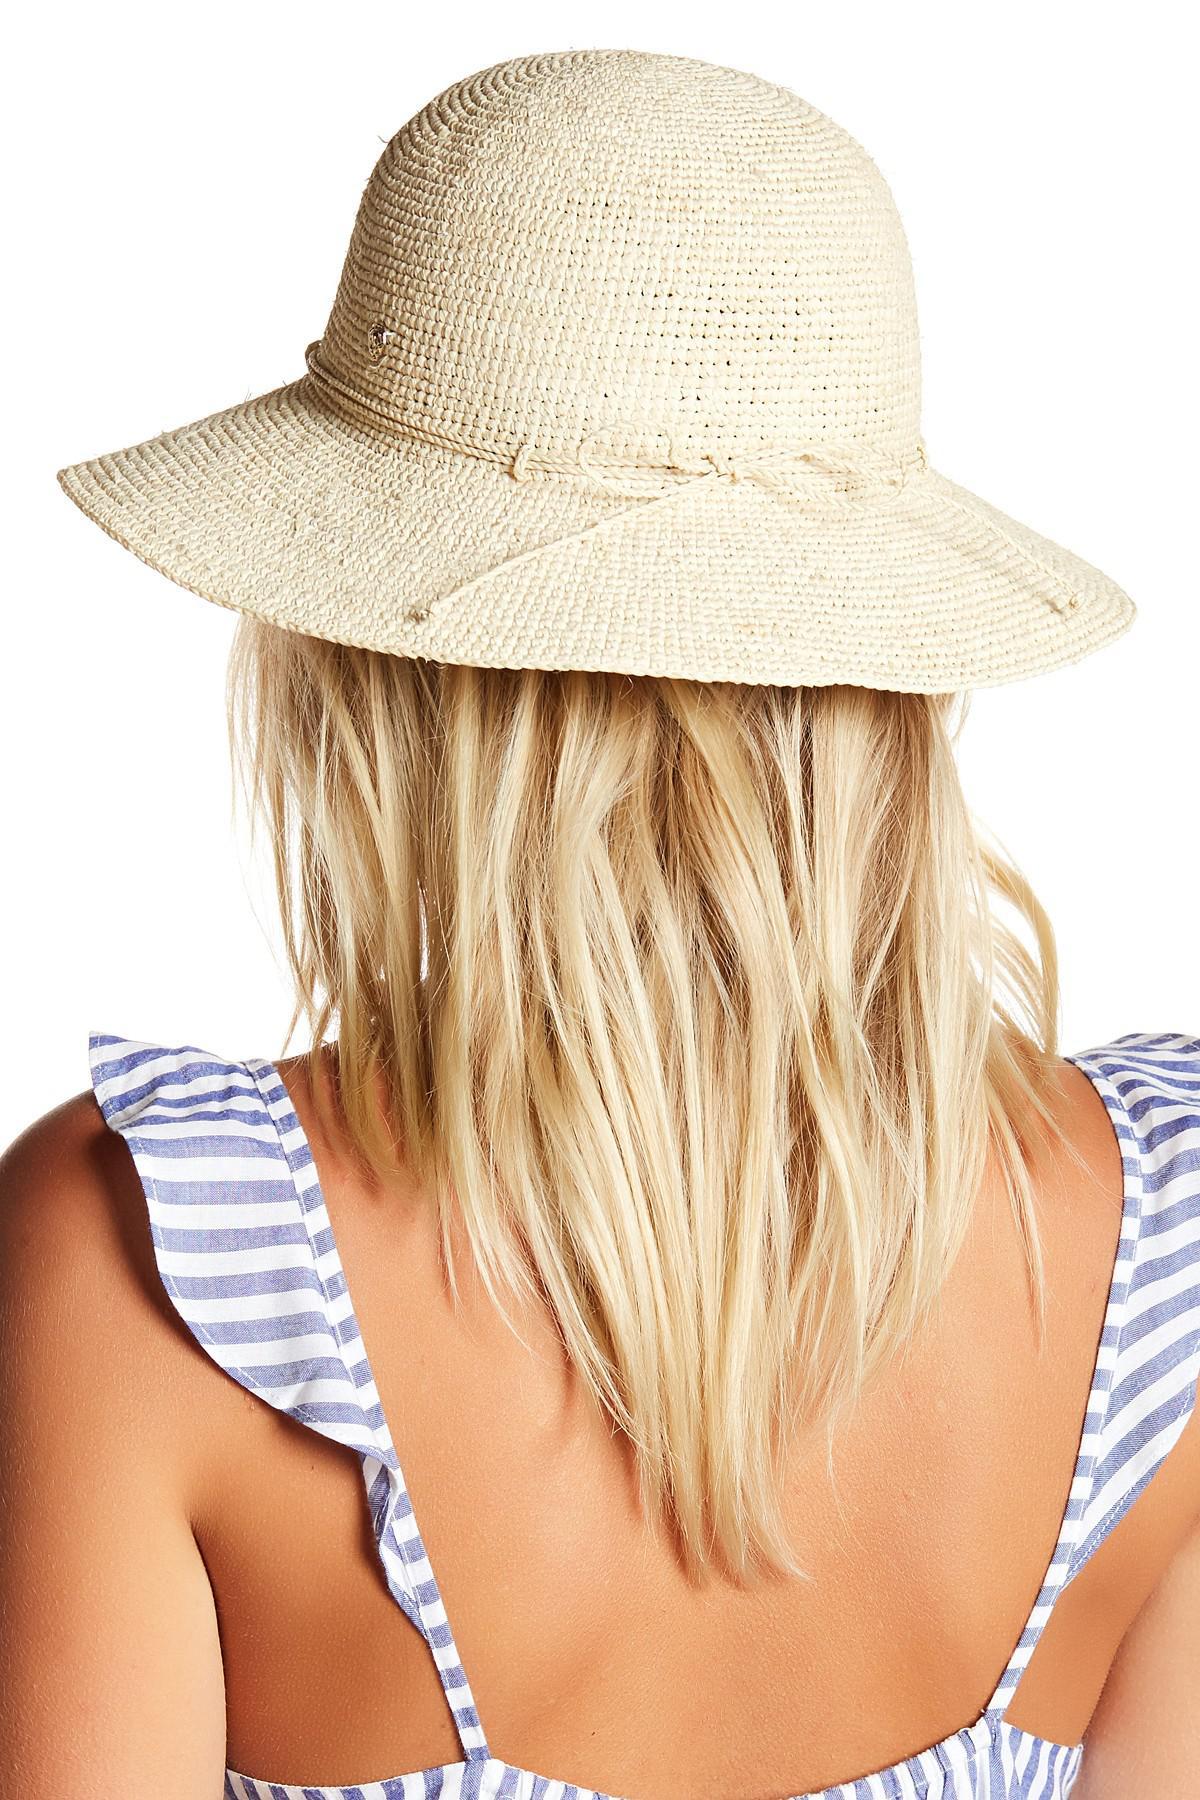 Lyst - Helen Kaminski Caicos Hat in Brown 80c01f41d479